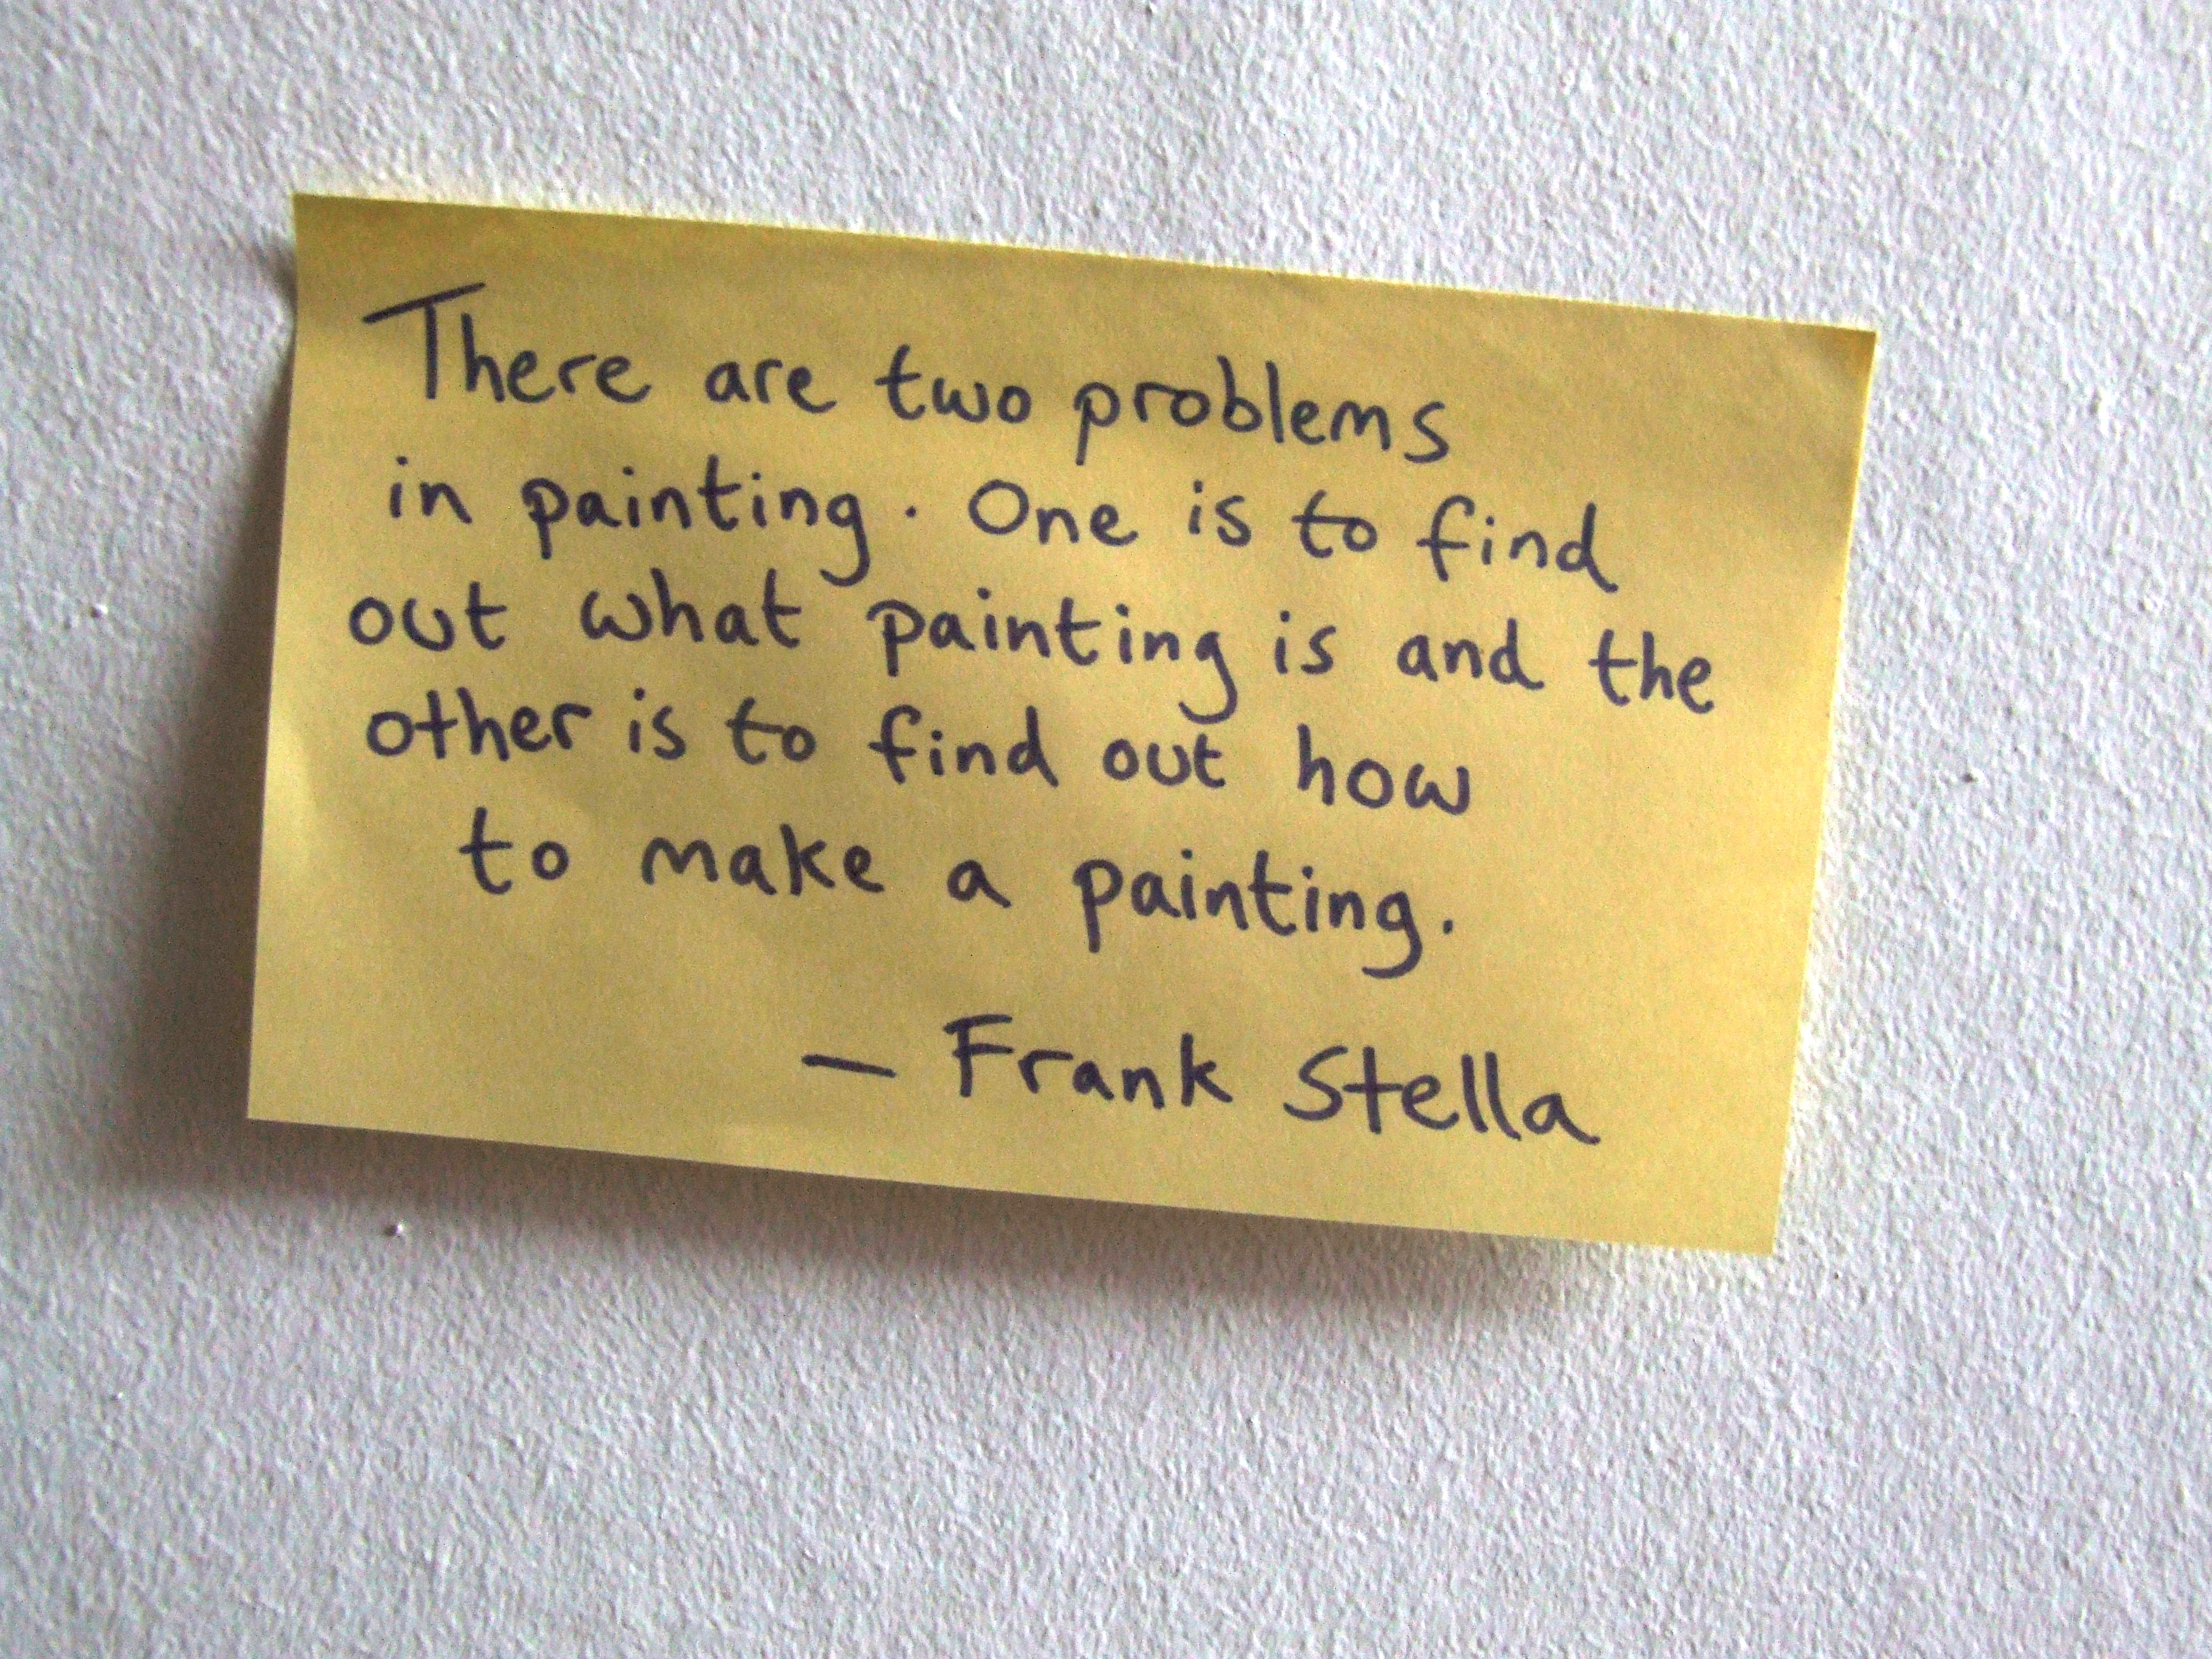 Frank Stella's quote #1